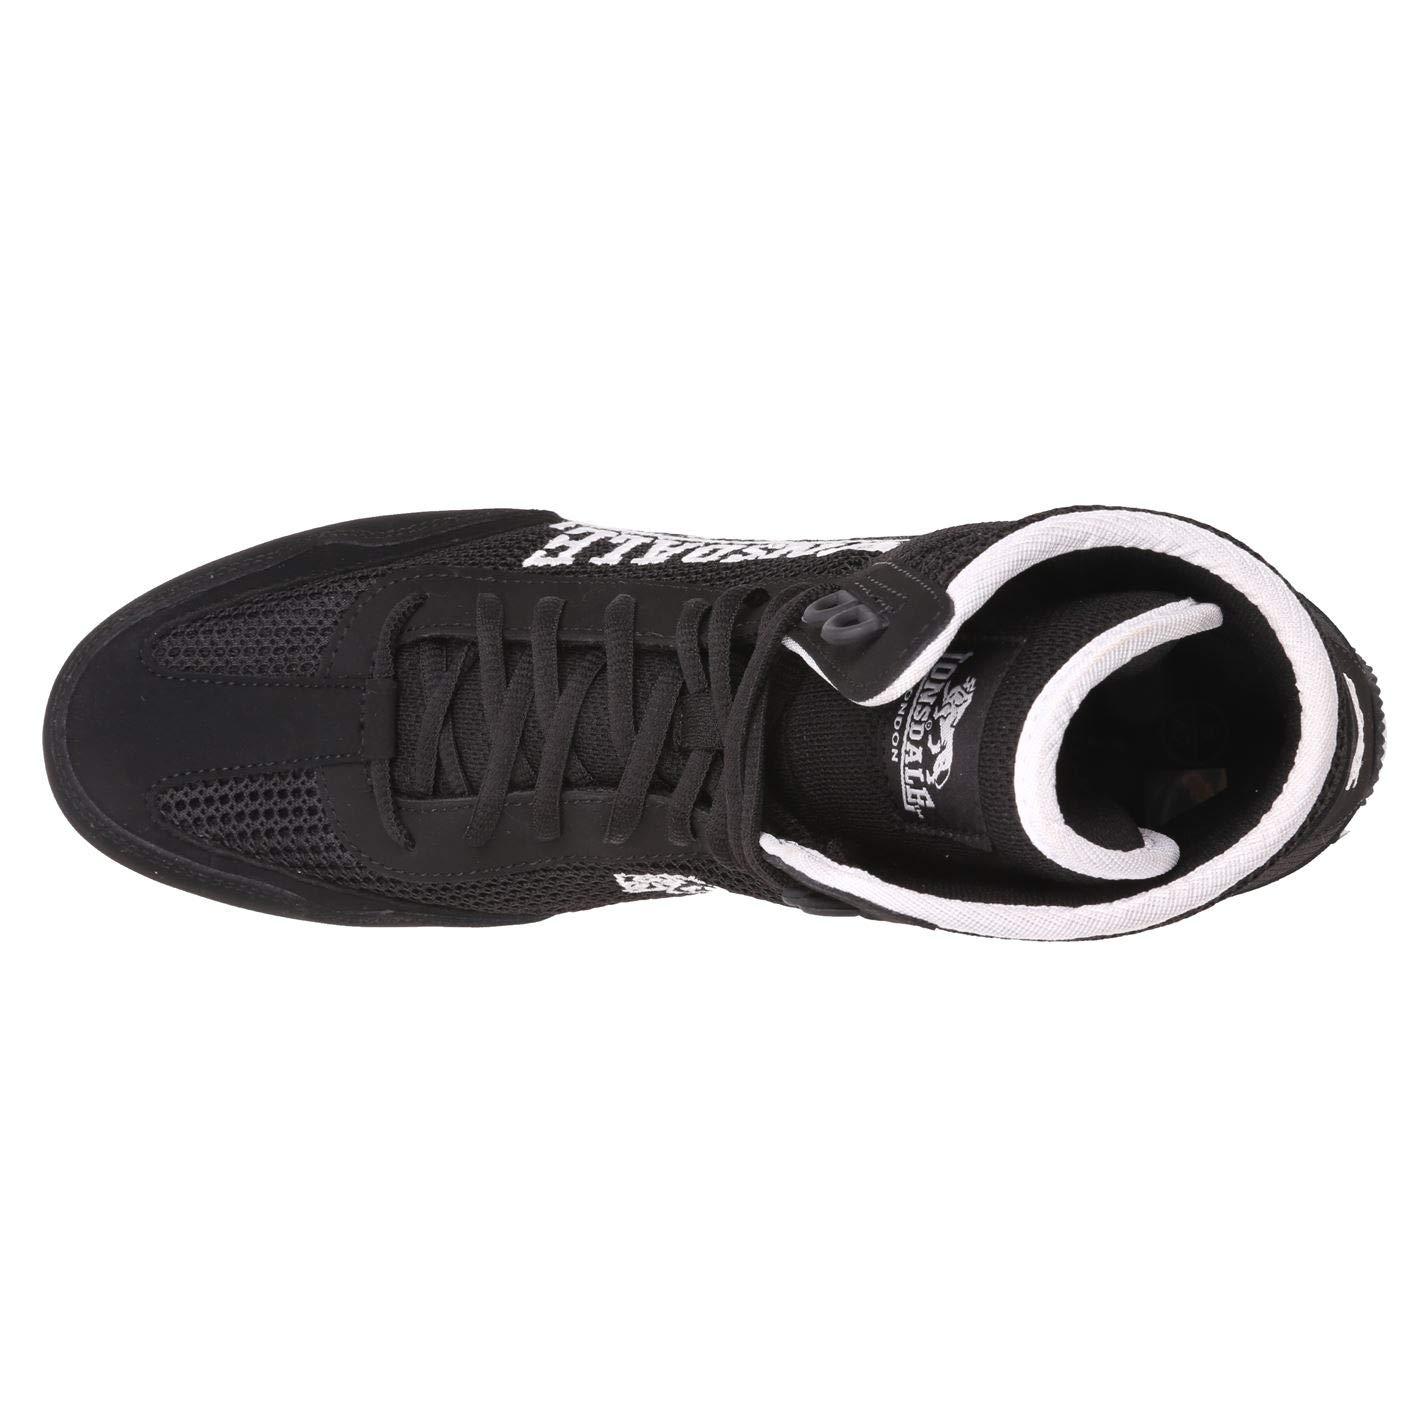 Lonsdale Kinder Jungen Contender Boxing Stiefel Schuhe Schnuerschuhe Extra Leicht